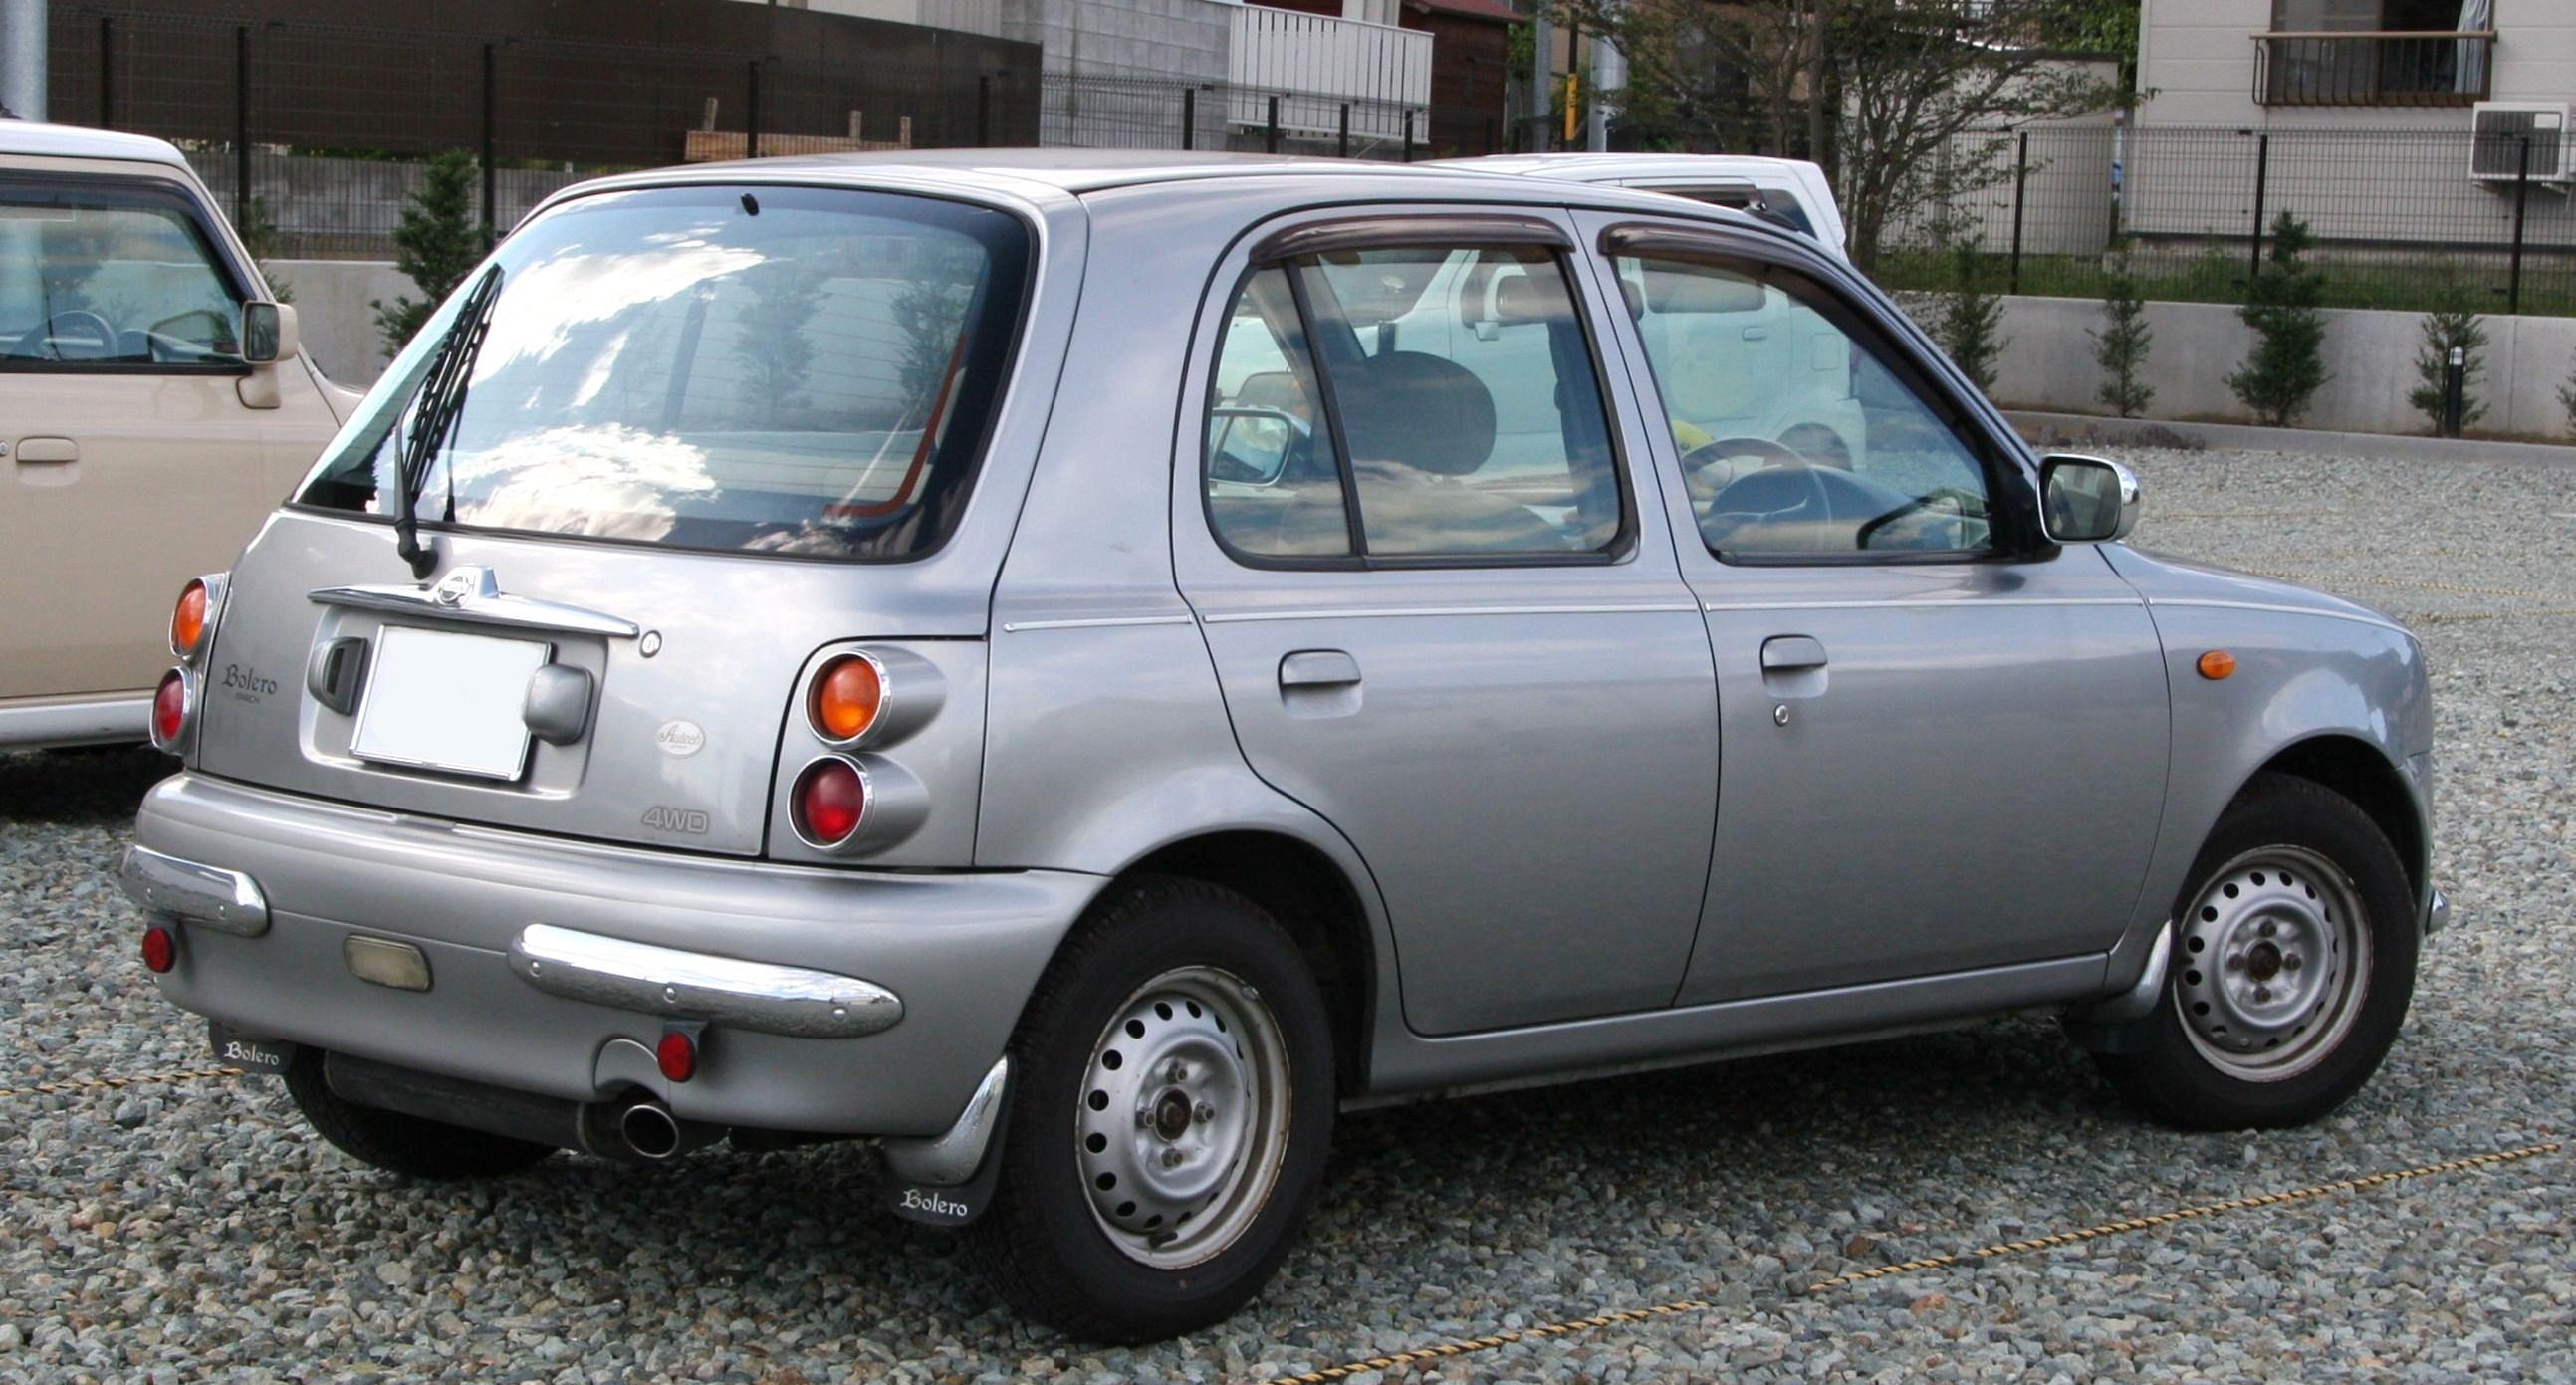 Nissan March Tuning >> File:NISSAN March Bolero rear.jpg - Wikimedia Commons